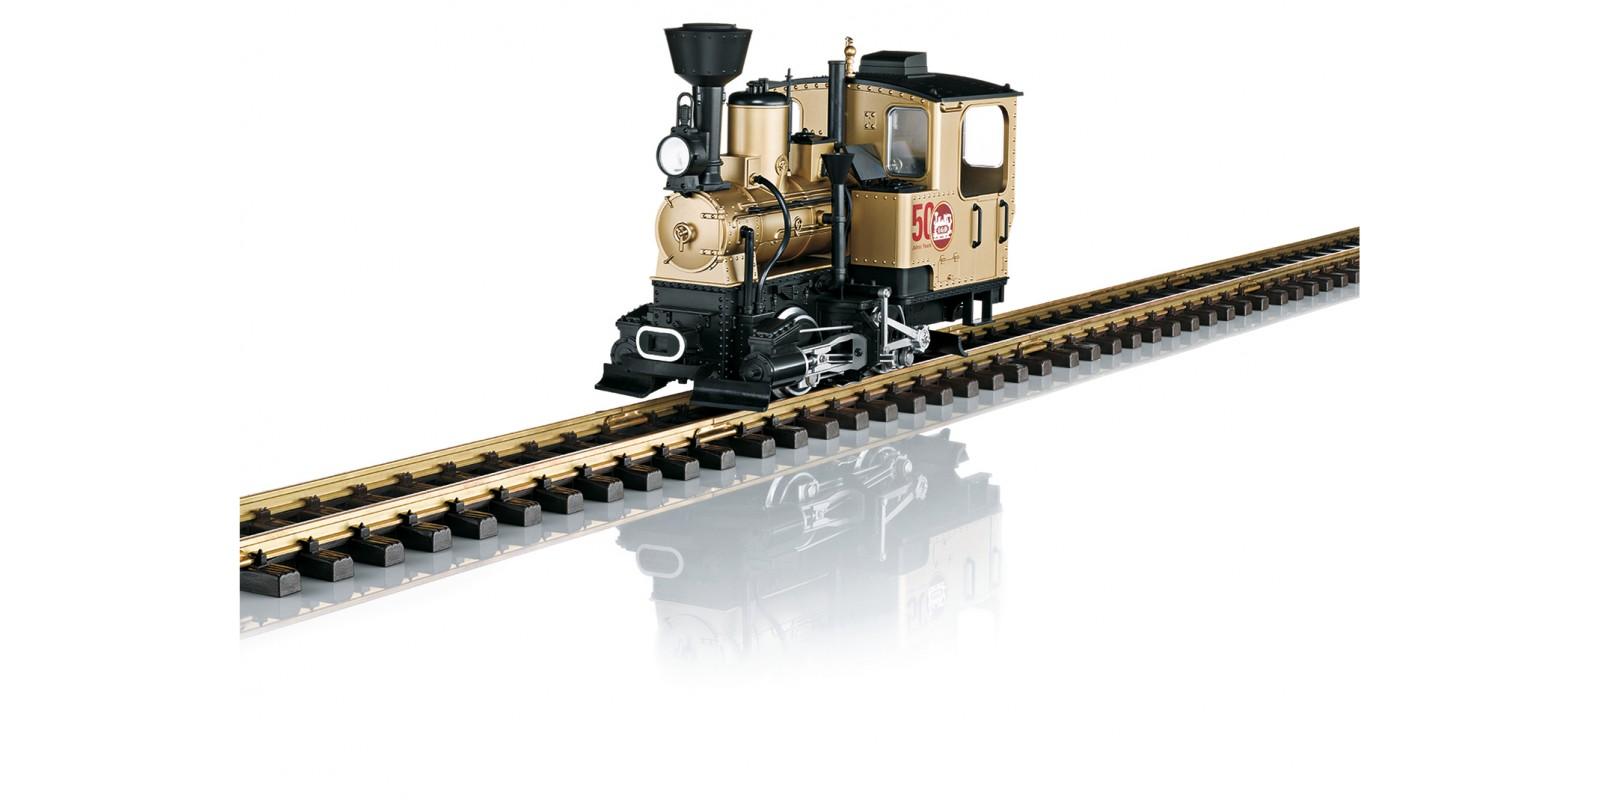 L20216 50 Years of LGB Anniversary Locomotive